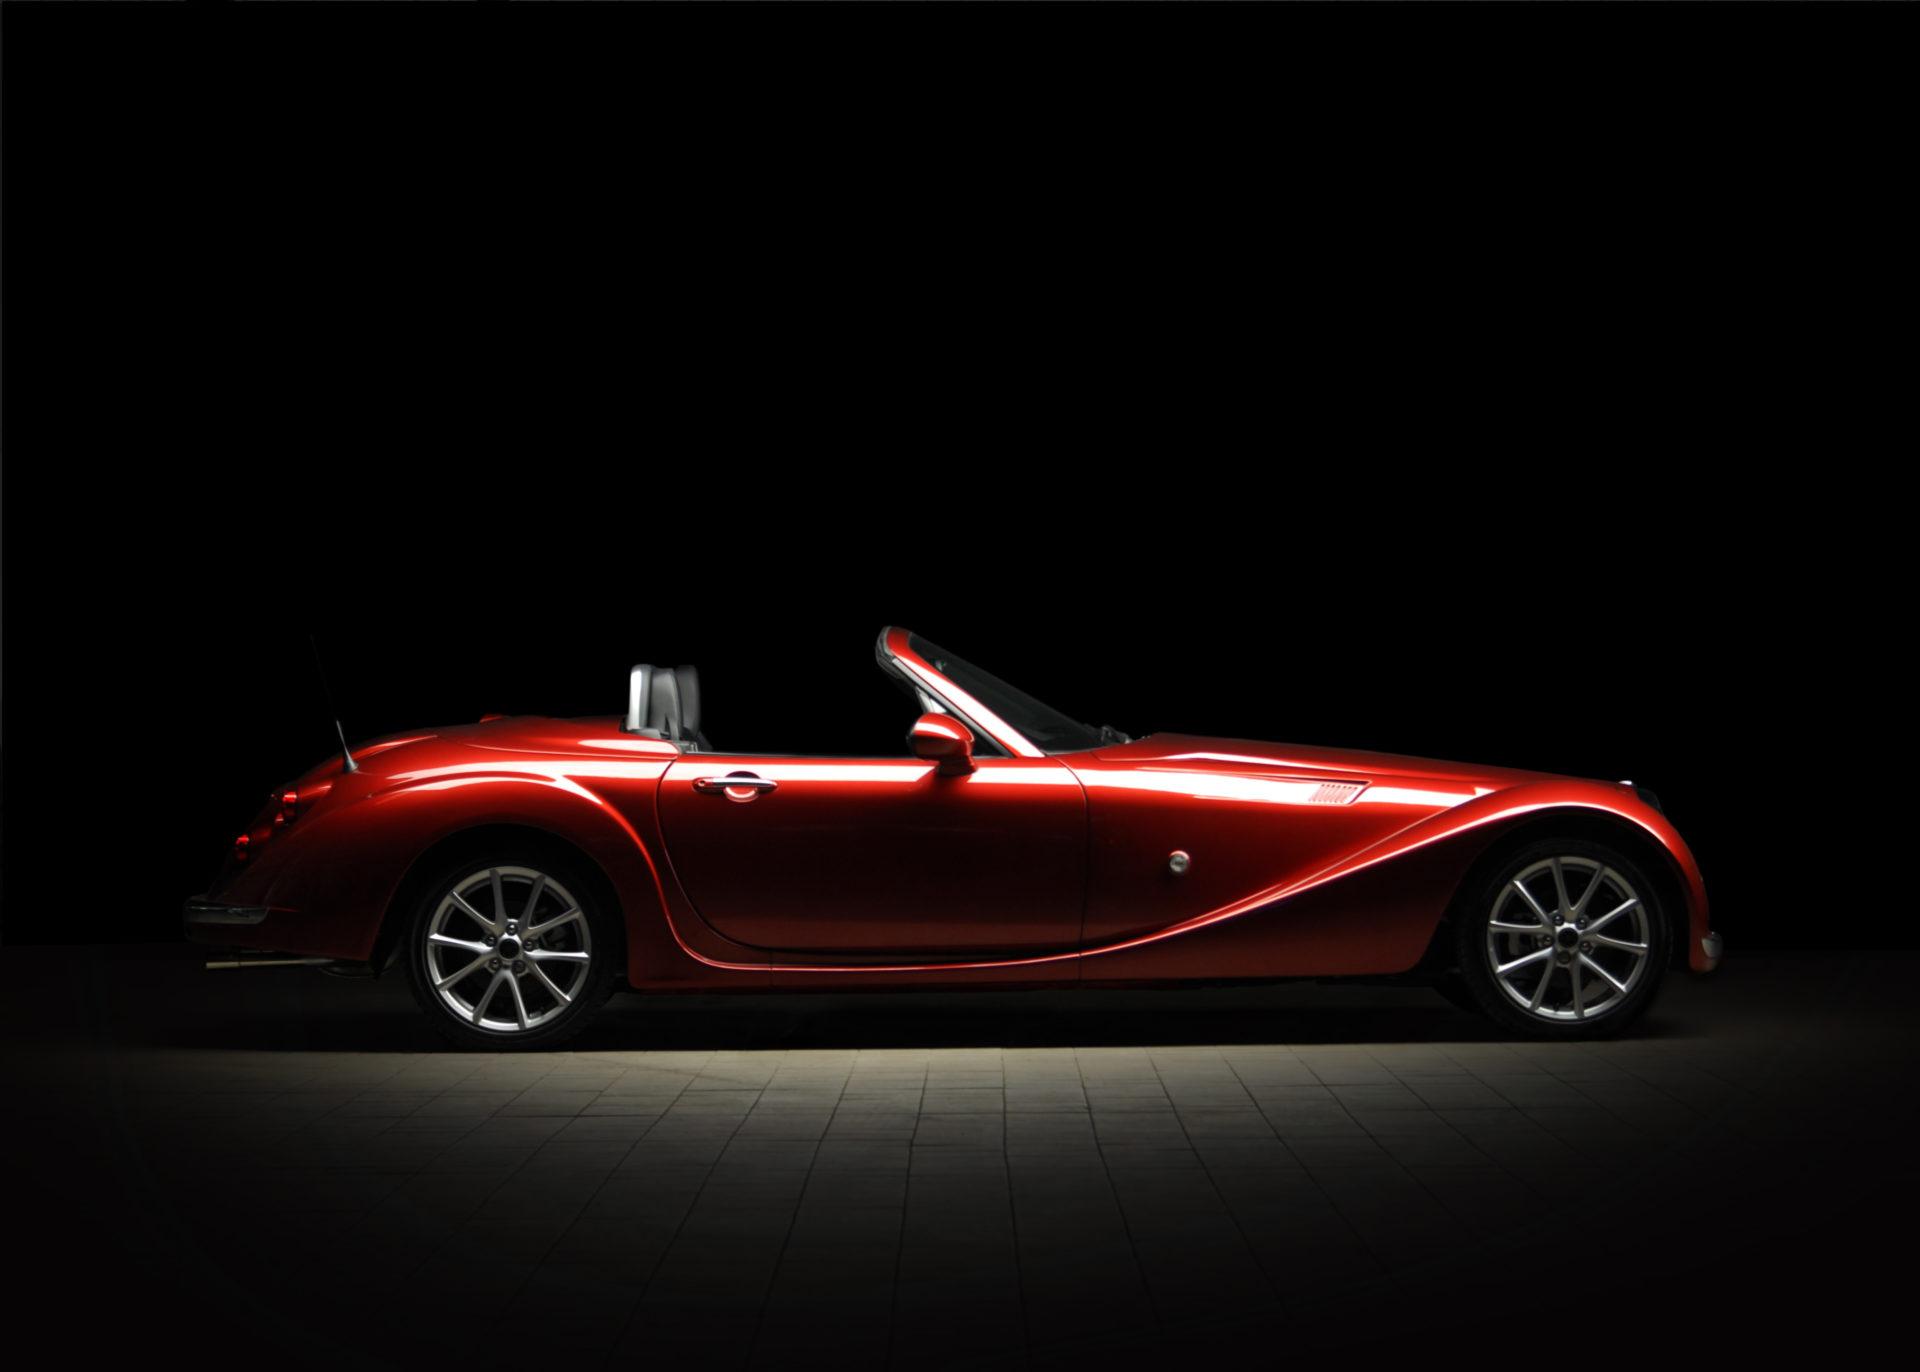 Mitsuoka Motor launches into UK